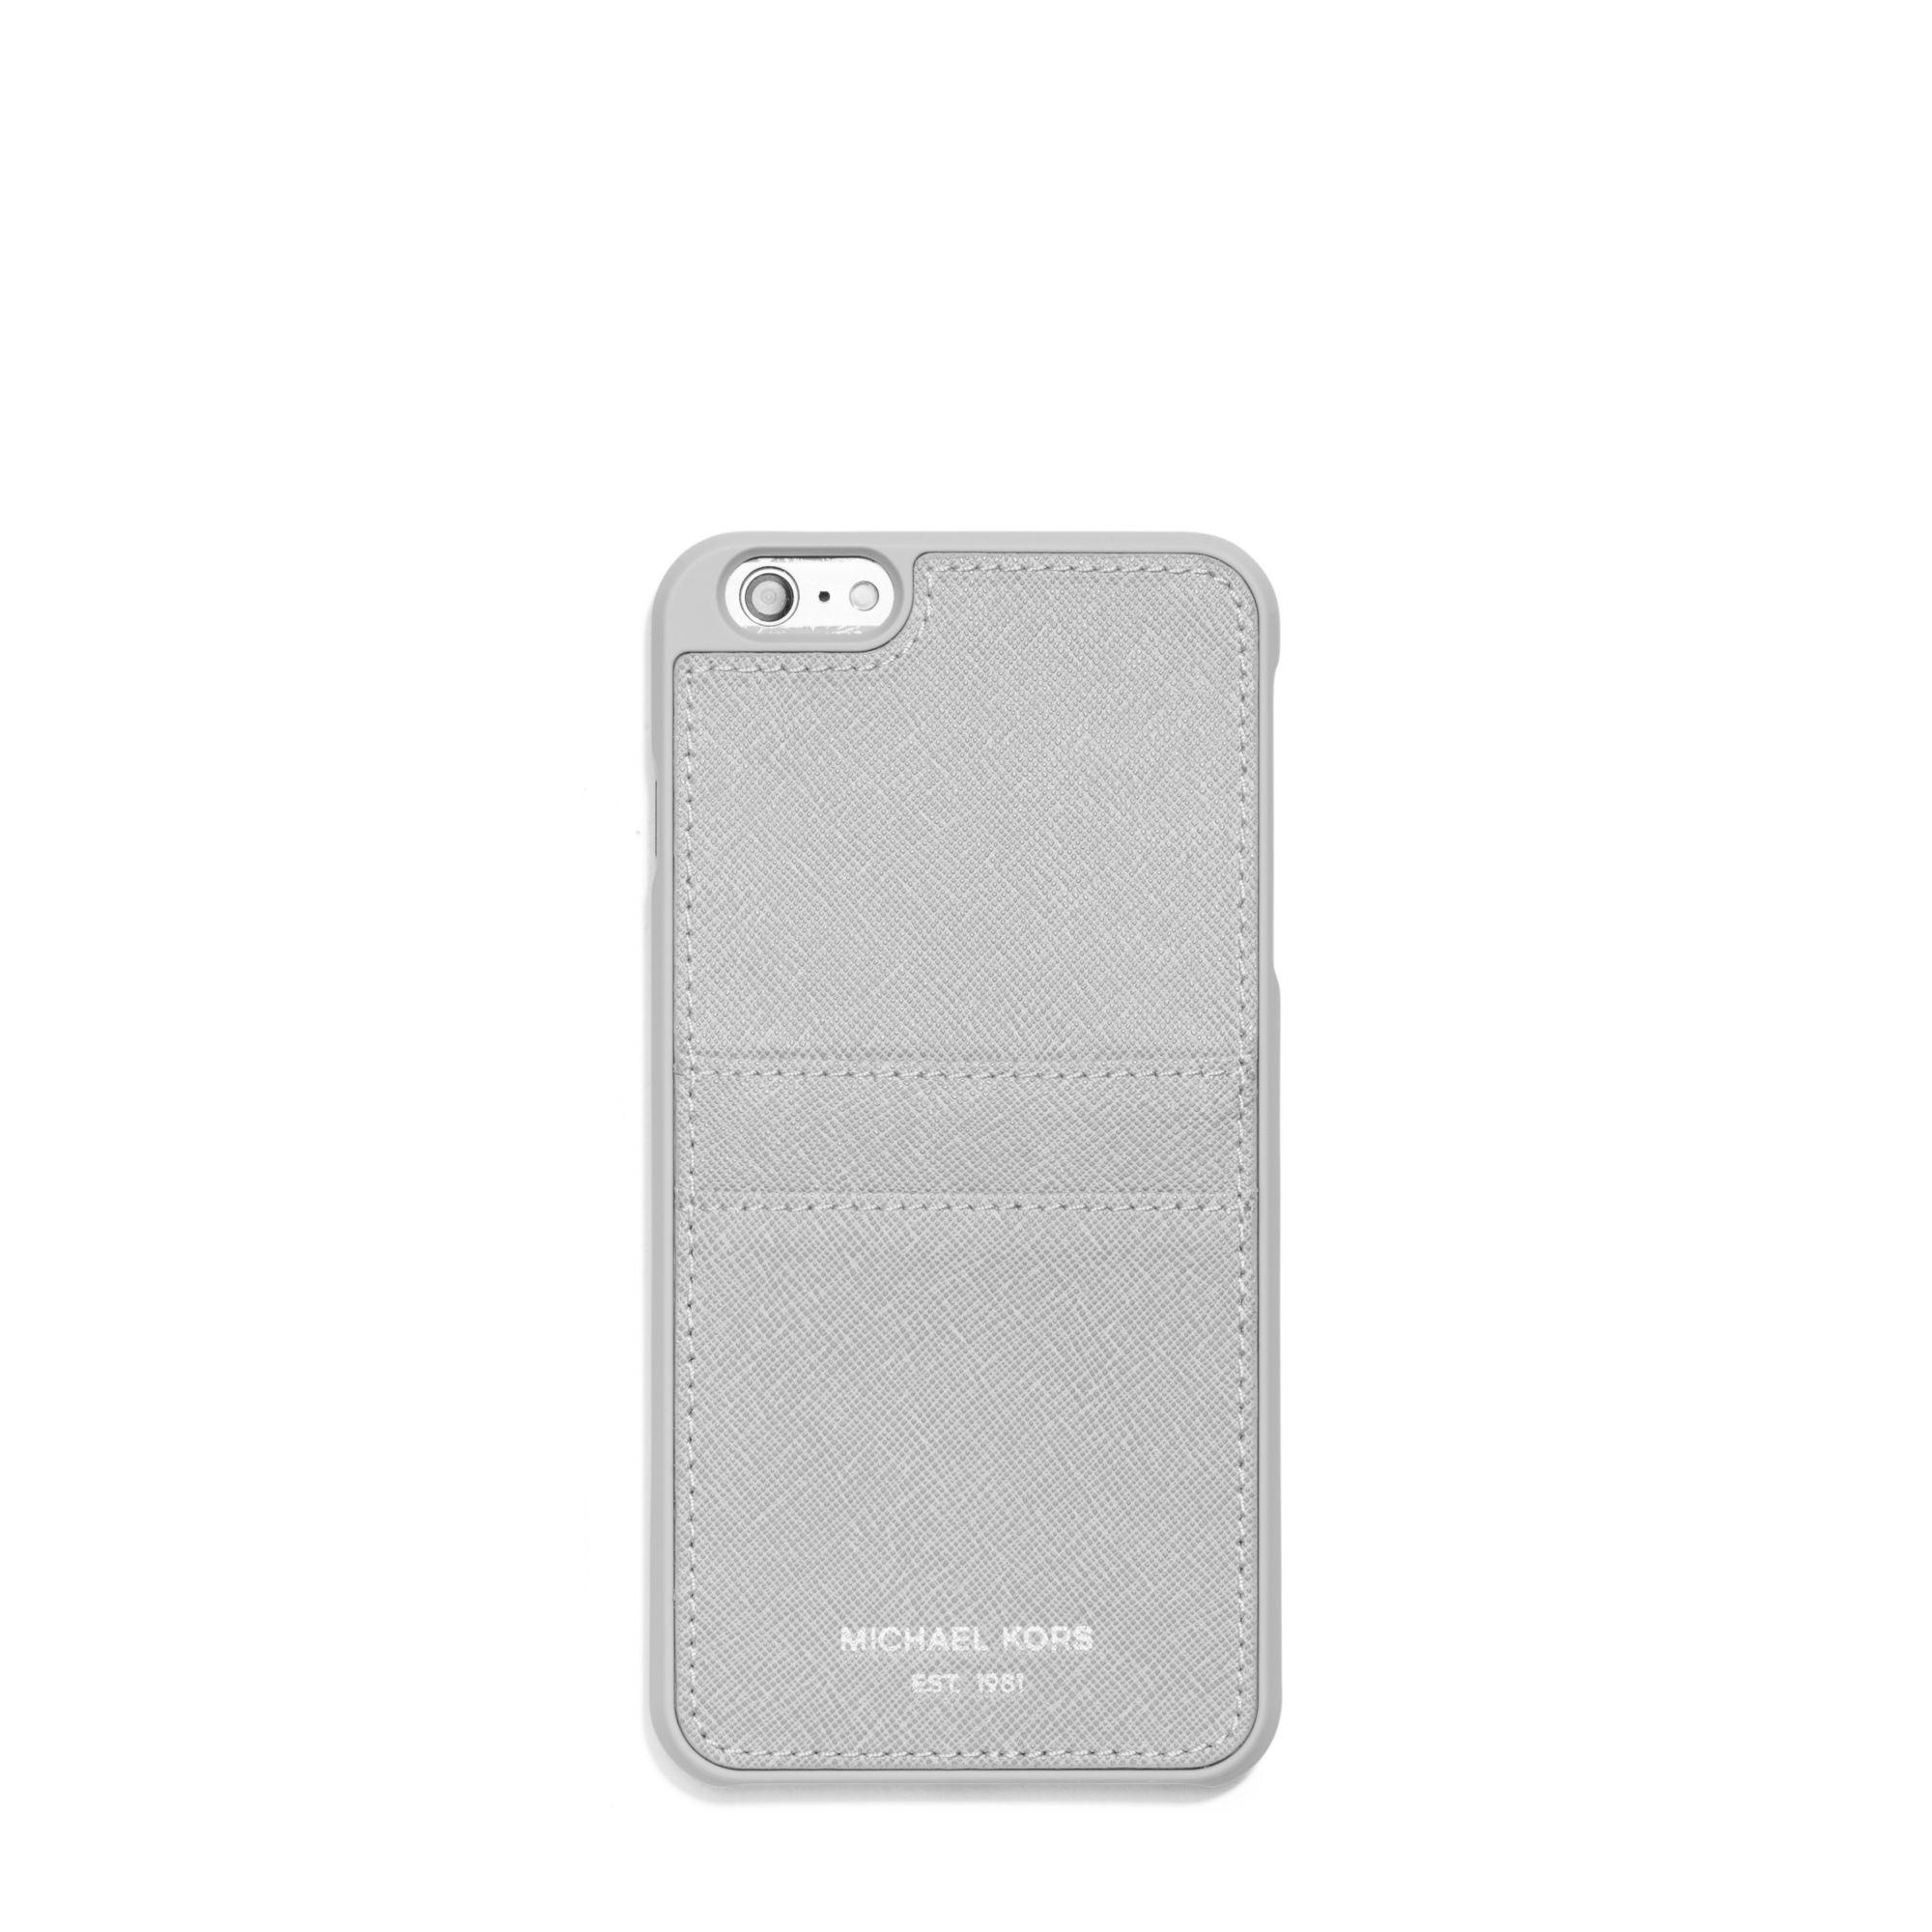 promo code 3bc45 88101 michael kors mens saffiano leather smartphone case black | Peninsula ...